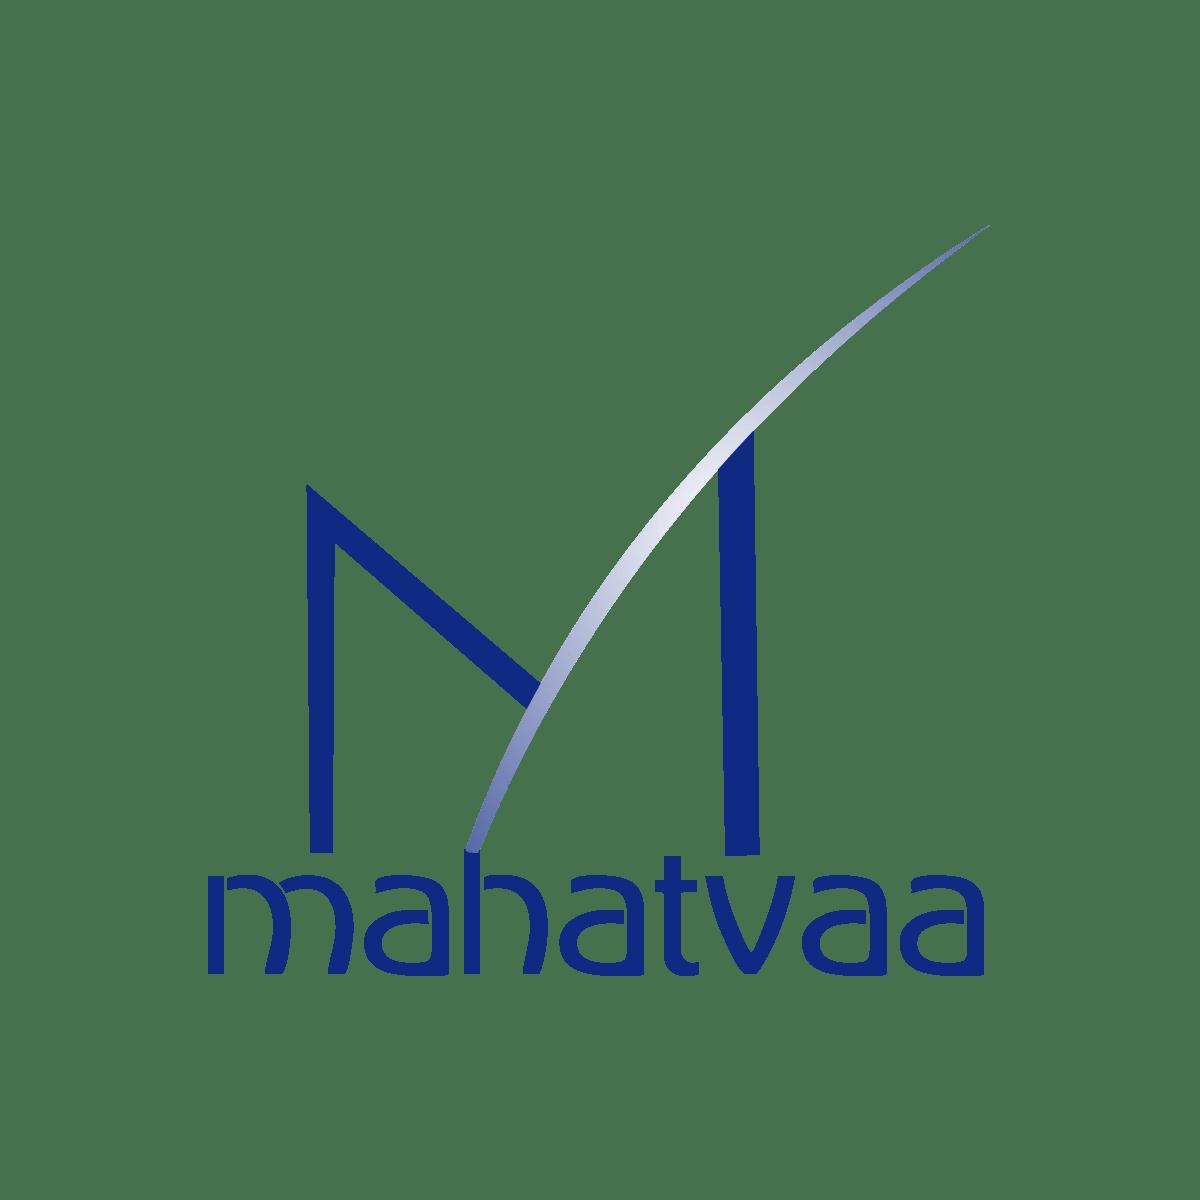 Mahatvaa